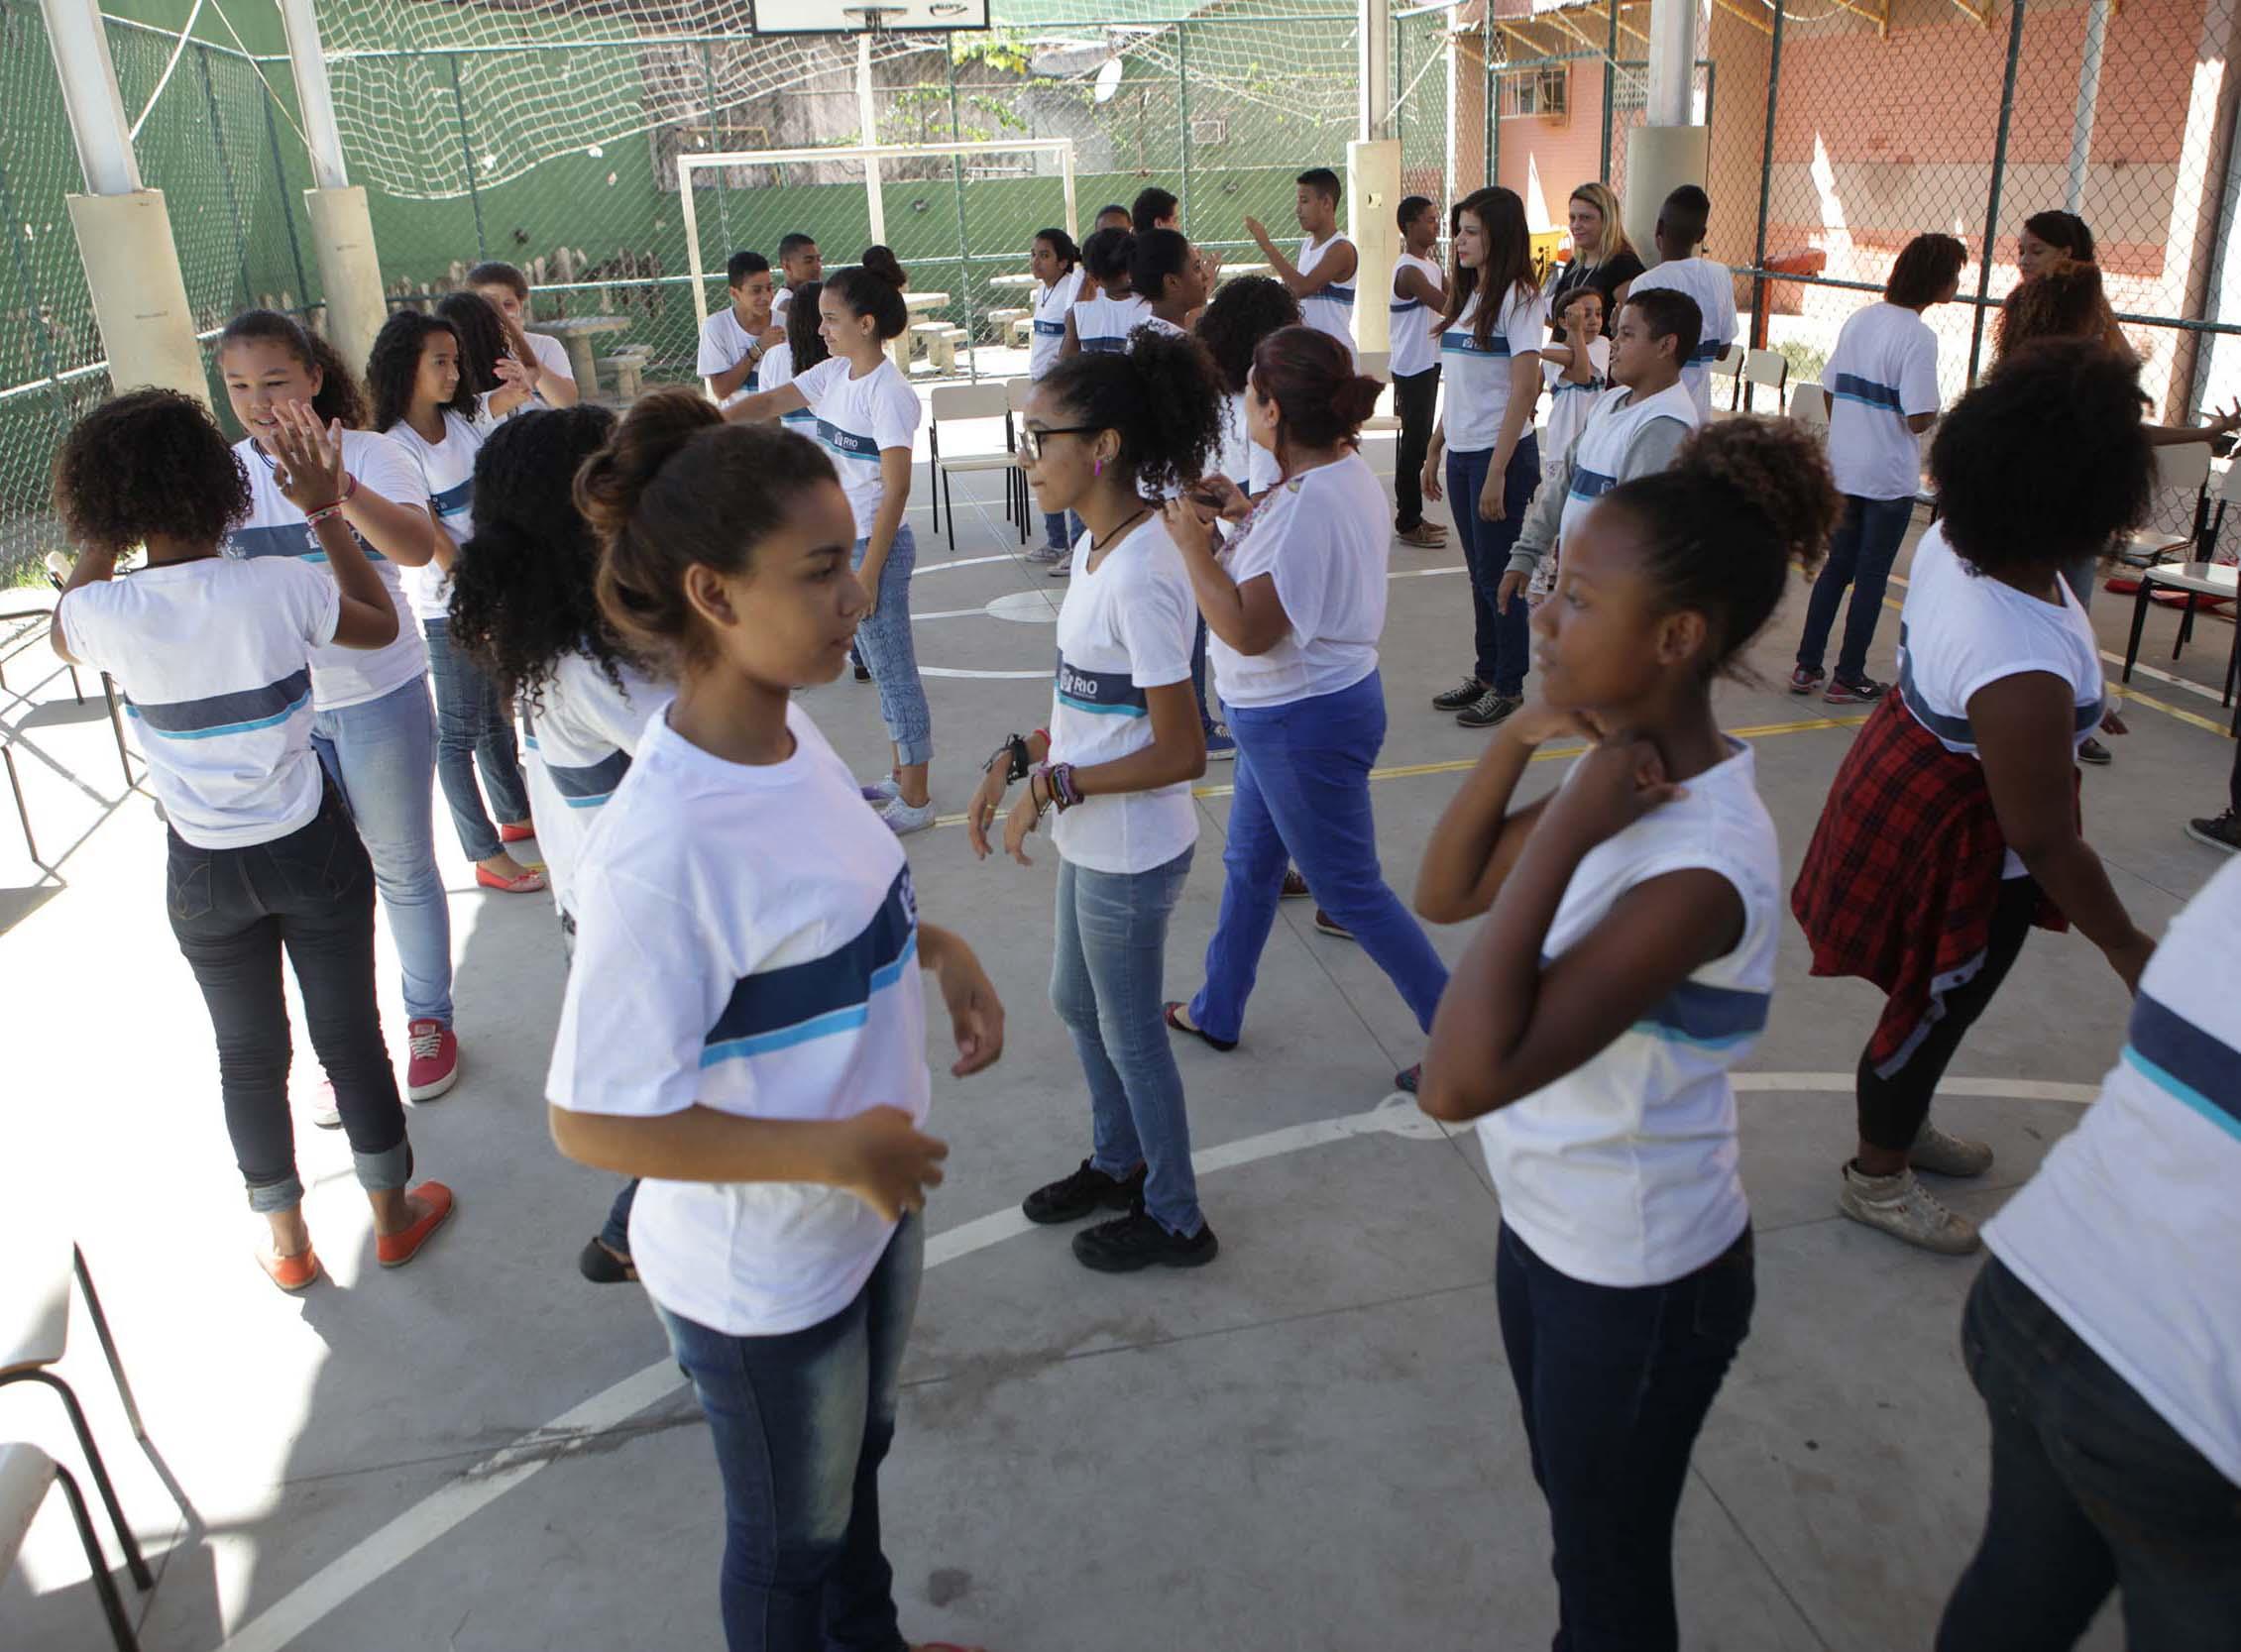 Oficina de teatro abre novos horizontes para alunos da Escola Municipal Jacques Raimundo